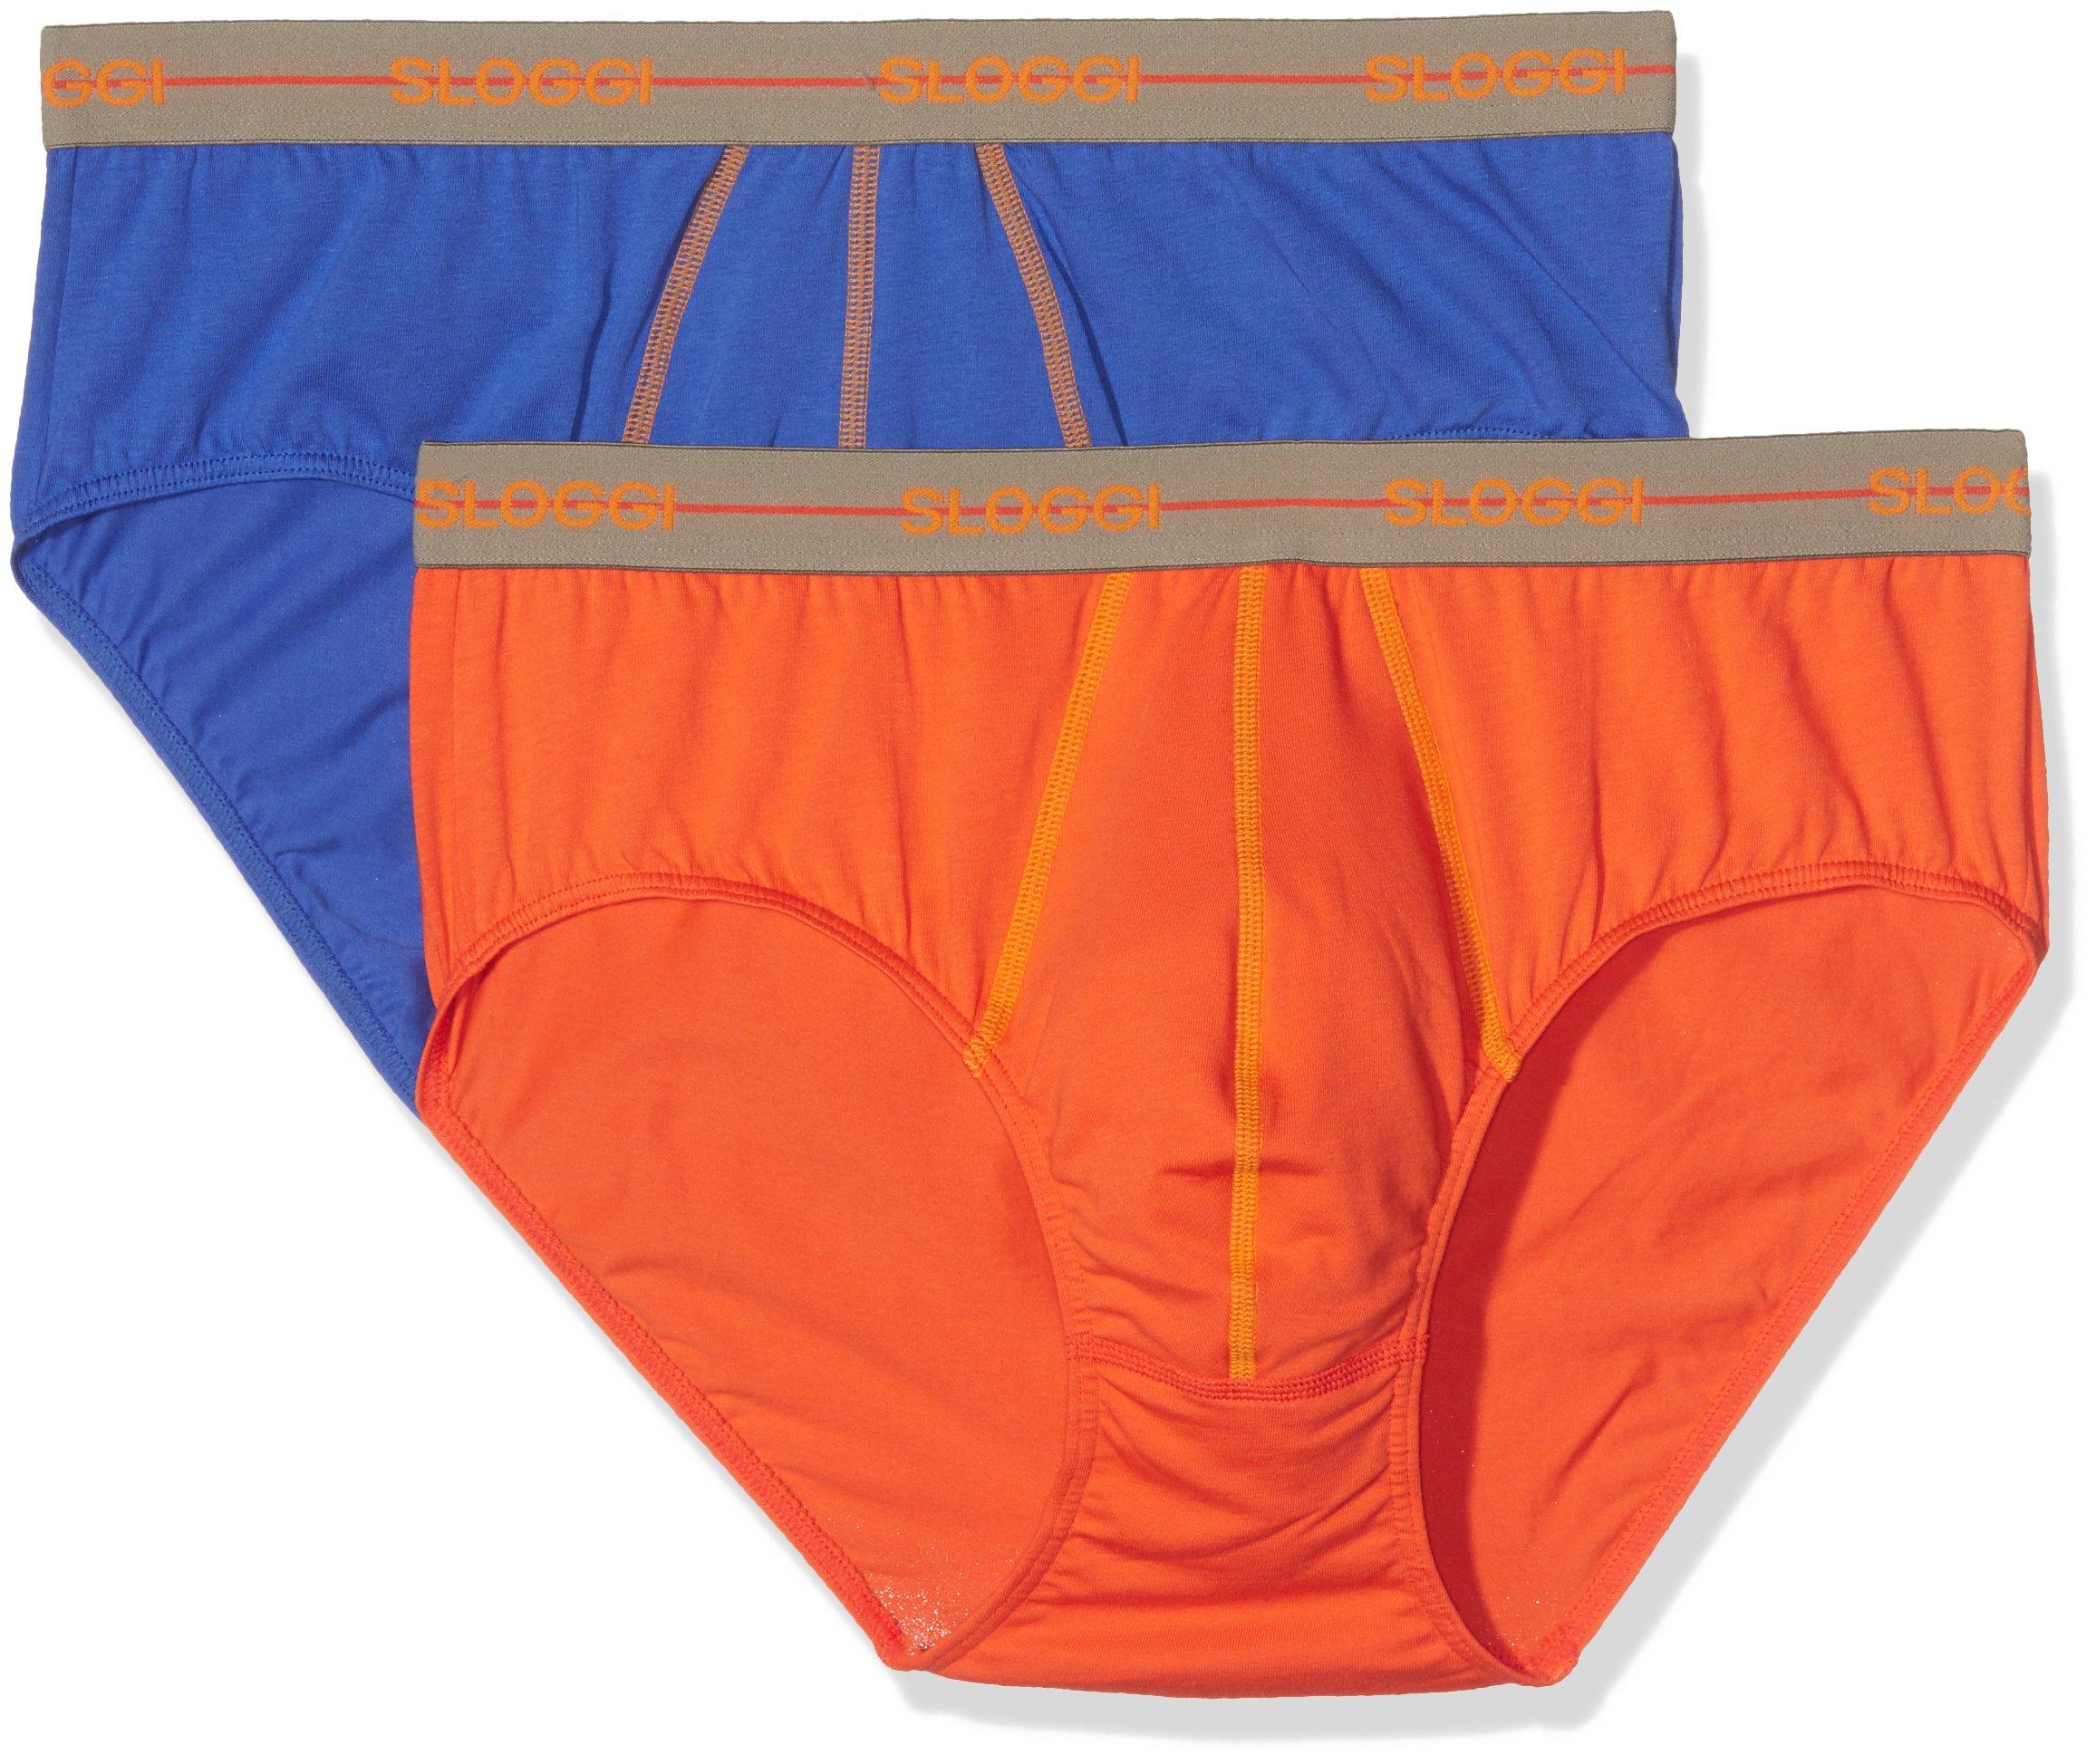 Sloggi Sloggi Men Start Midi C2p, Slip Uomo, Multicolore (1 Bleu + 1 Orange), Small (Taglia Produtt